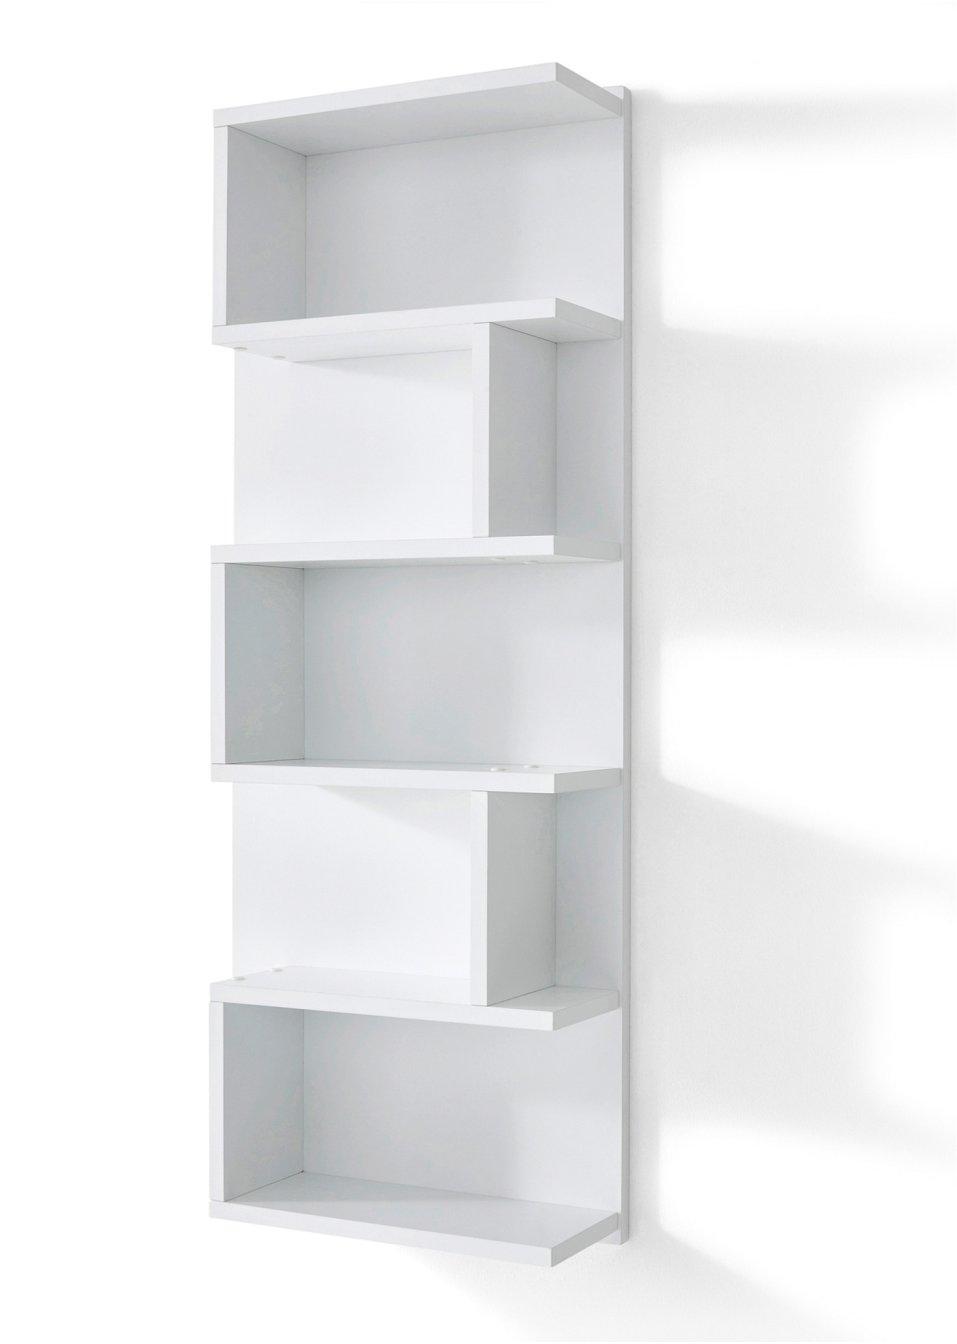 wandregal ricardo wei bpc living online kaufen. Black Bedroom Furniture Sets. Home Design Ideas